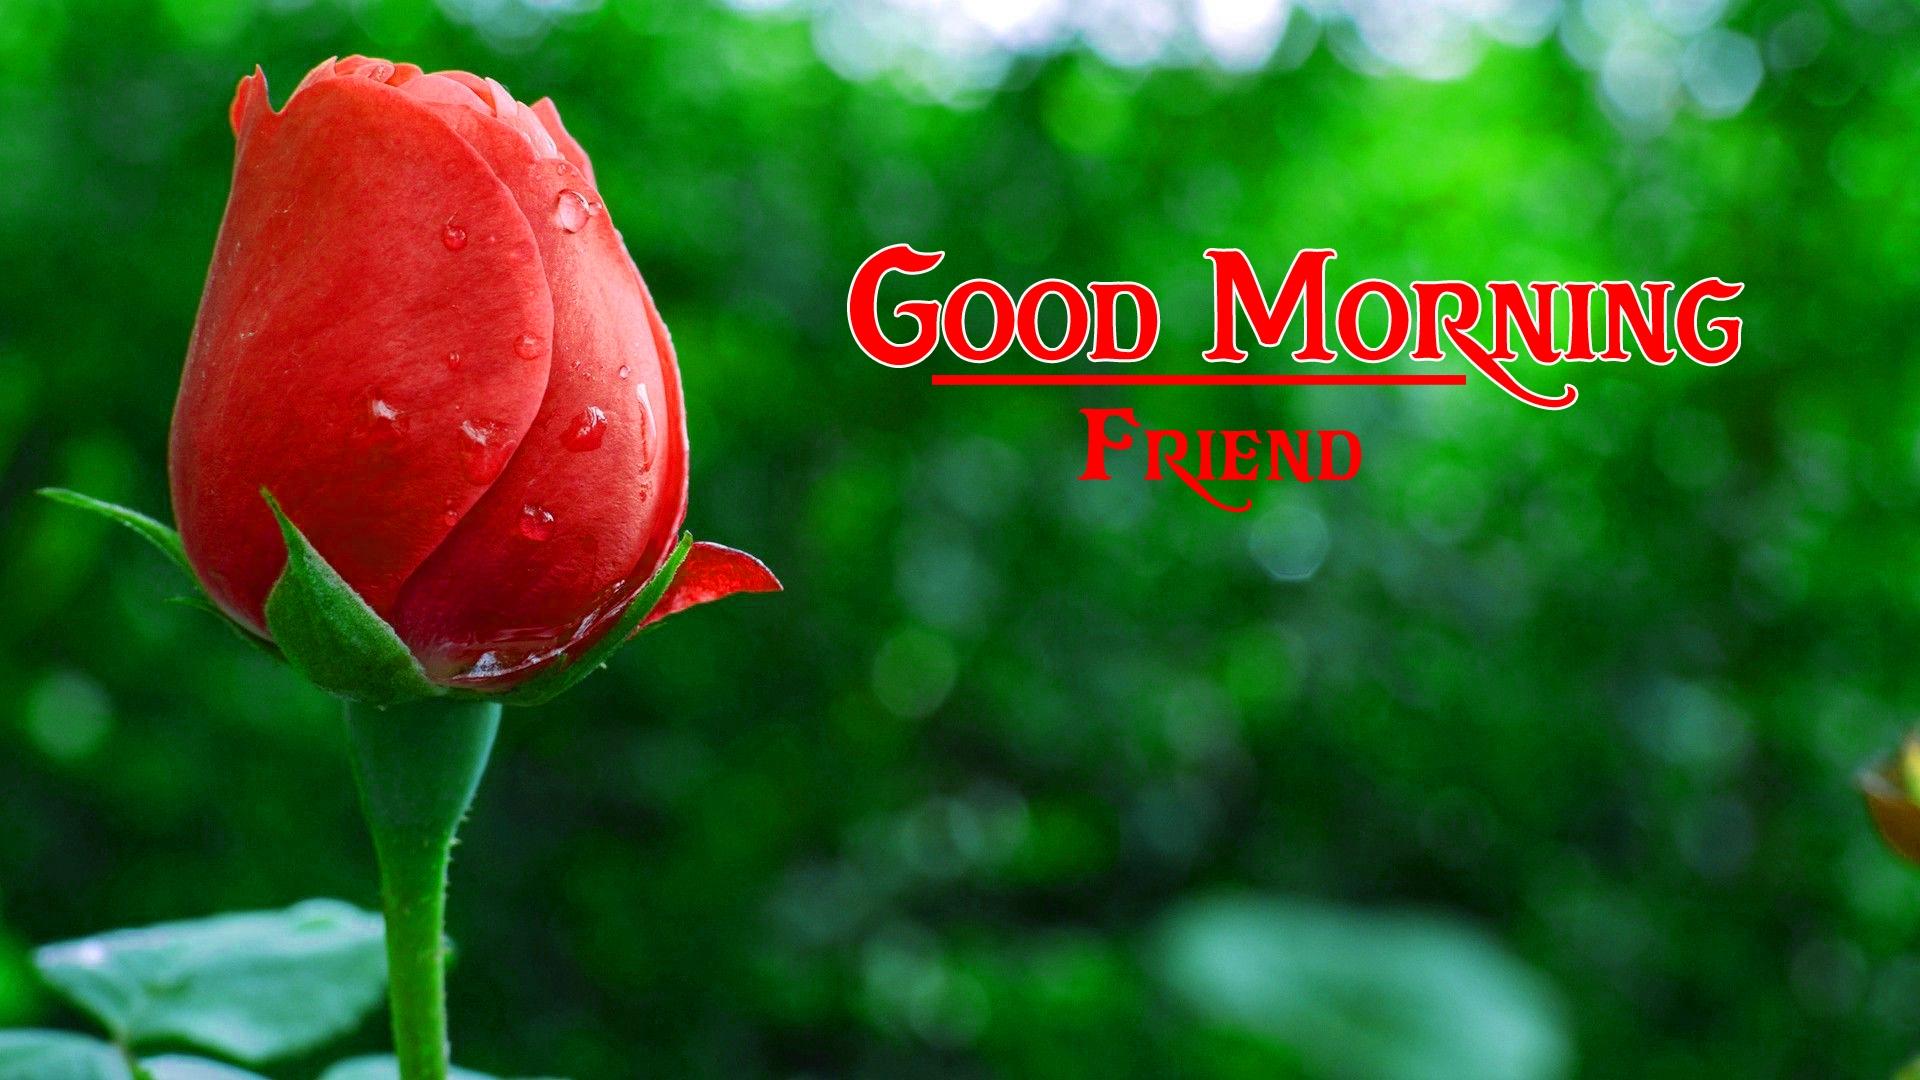 good morning photo 2 1